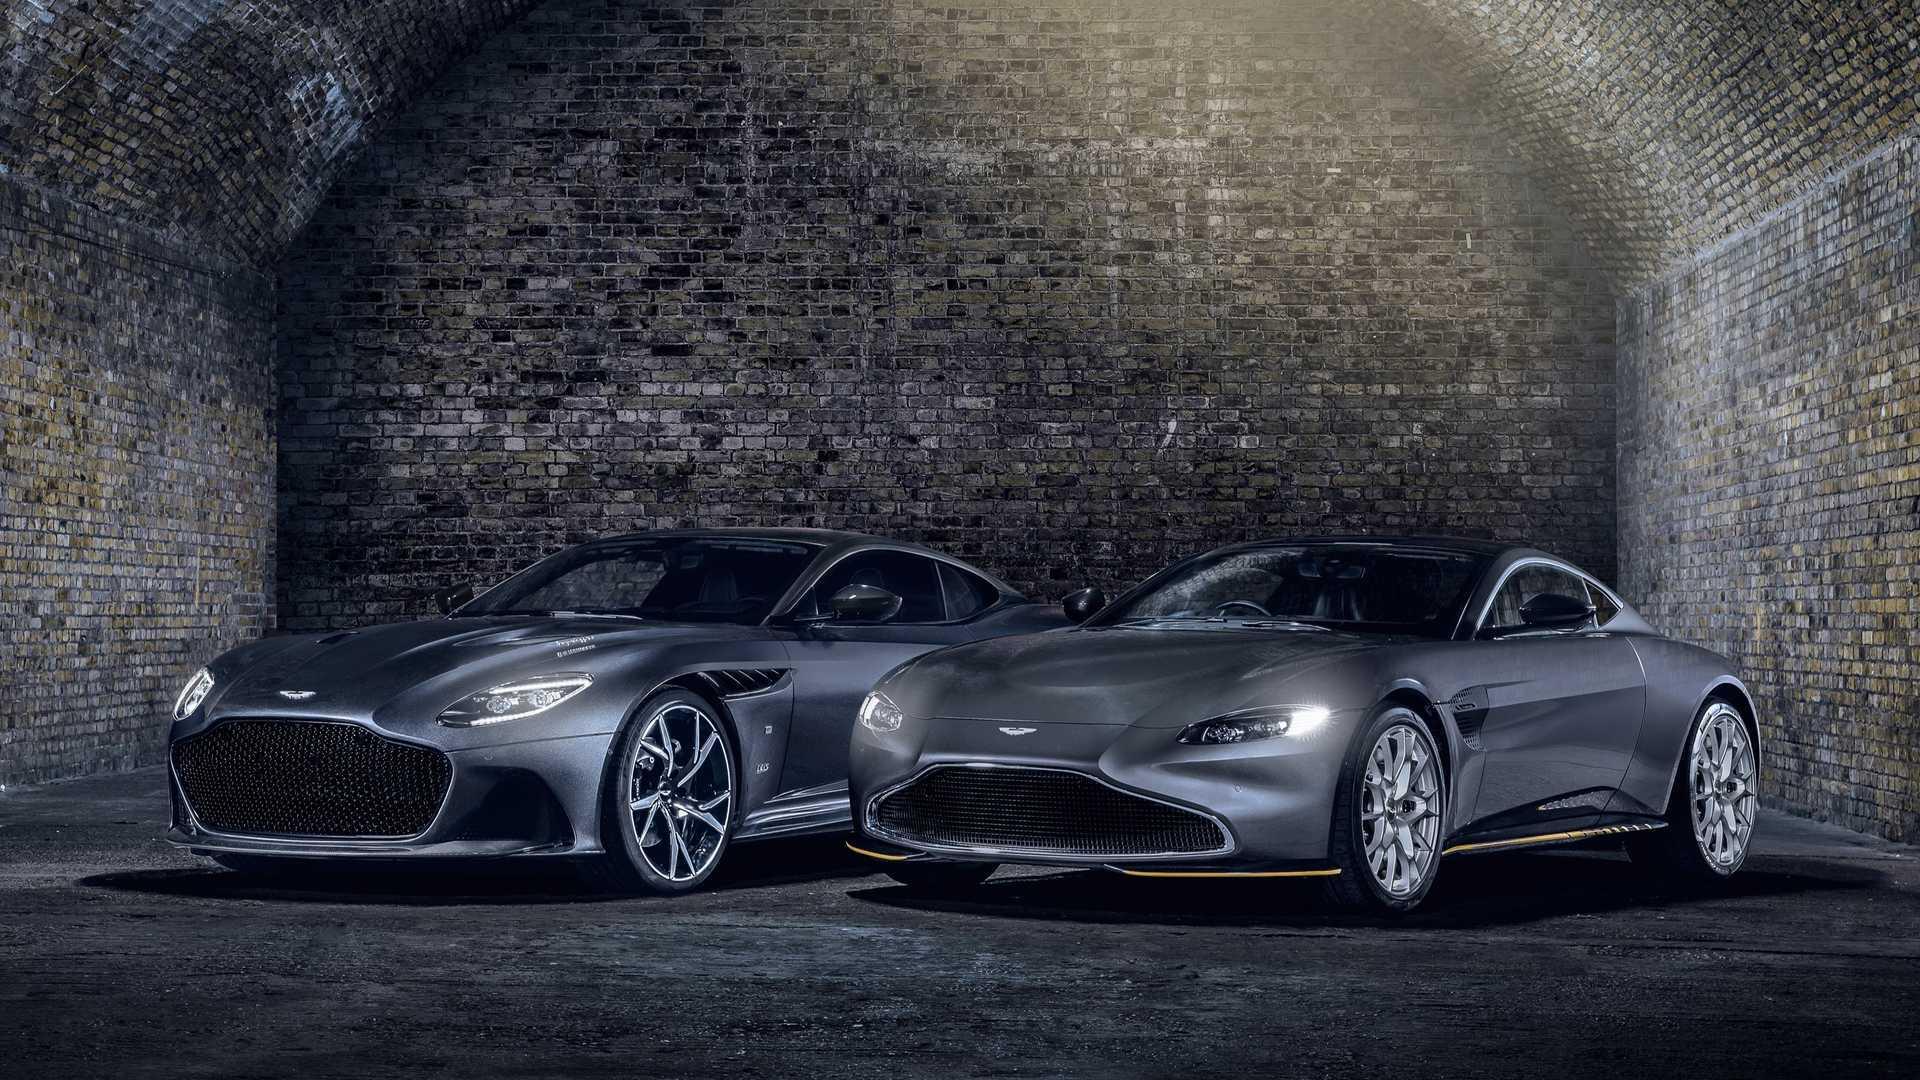 Aston Martin 007 Edition Models Celebrate New James Bond Movie Release